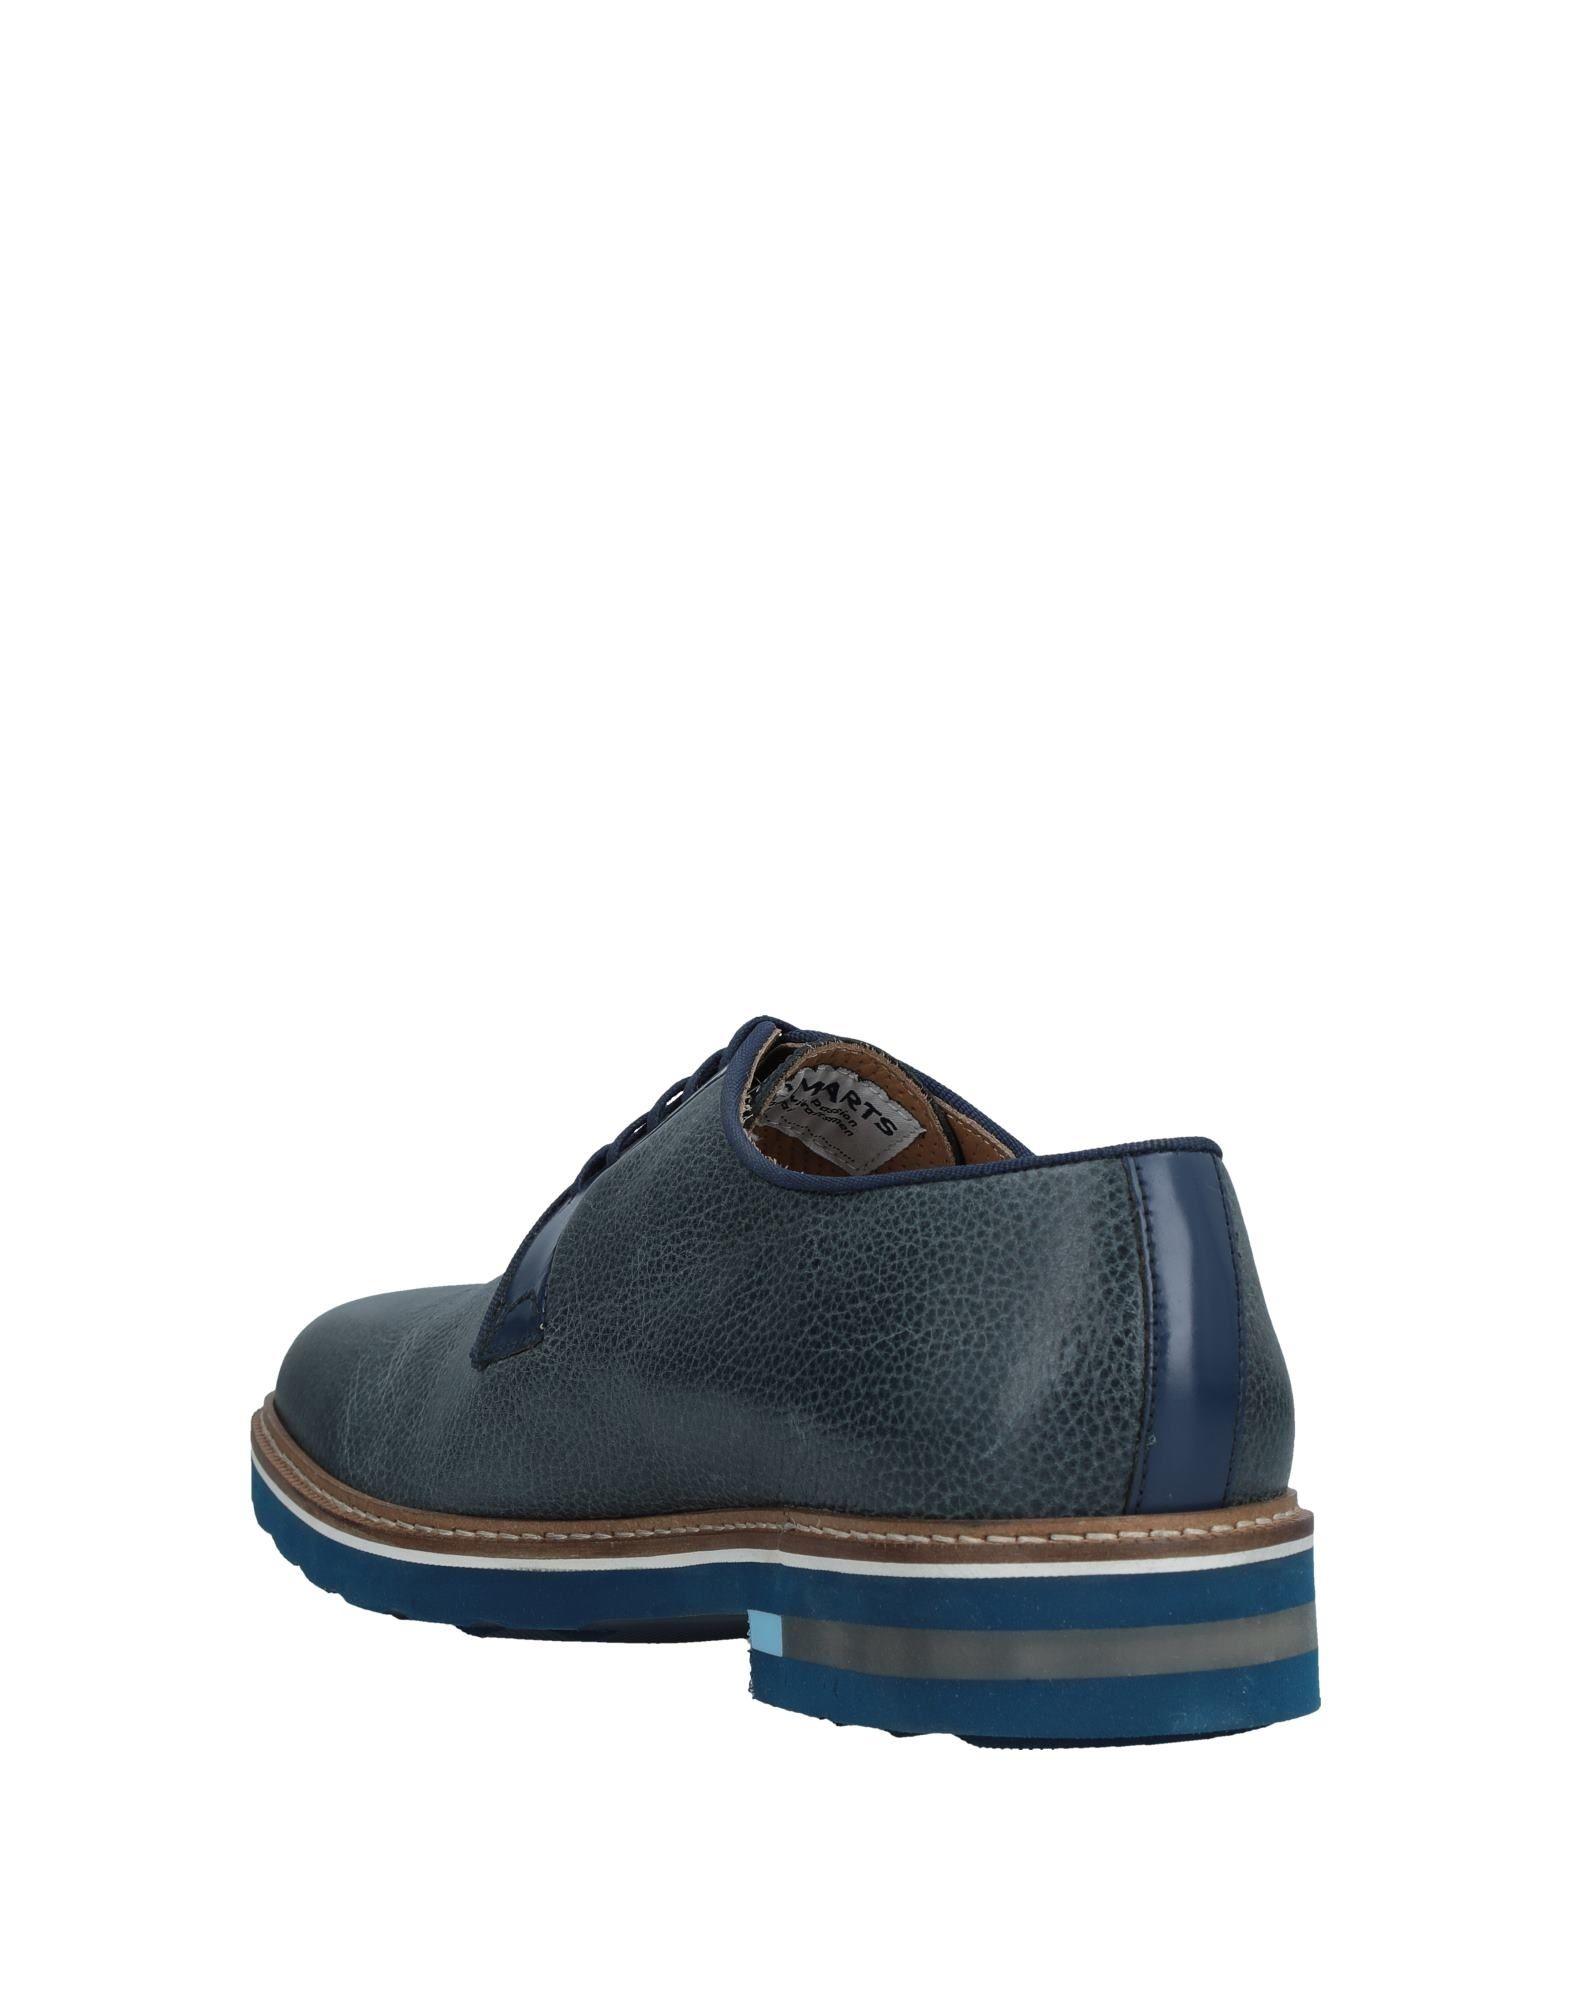 Rabatt Schuhe echte Schuhe Rabatt Brimarts Schnürschuhe Herren  11535035GS 9cc139